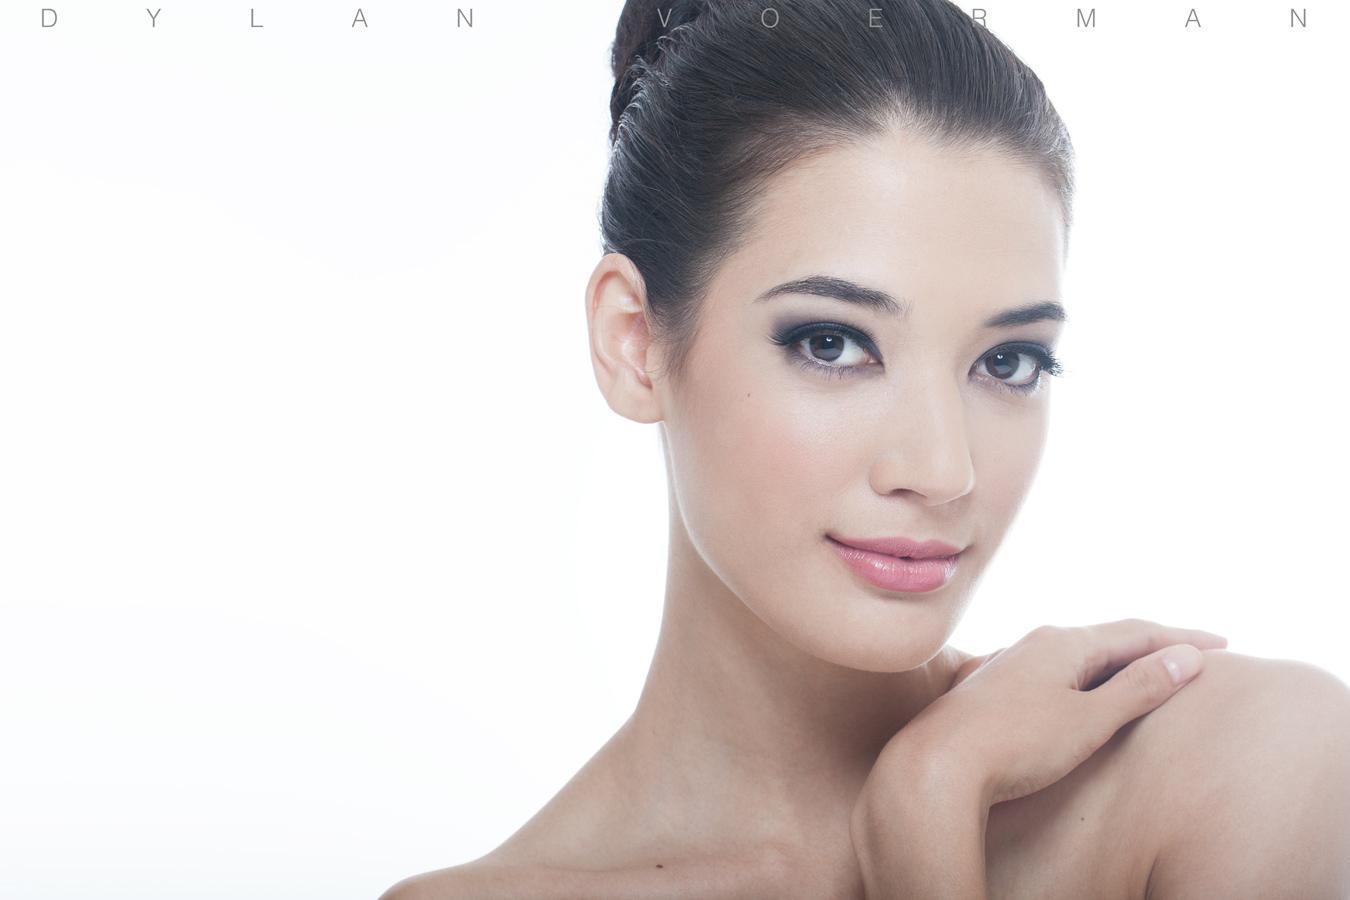 Model Cassandra Silver from New Sealand in Bangkok Thailand